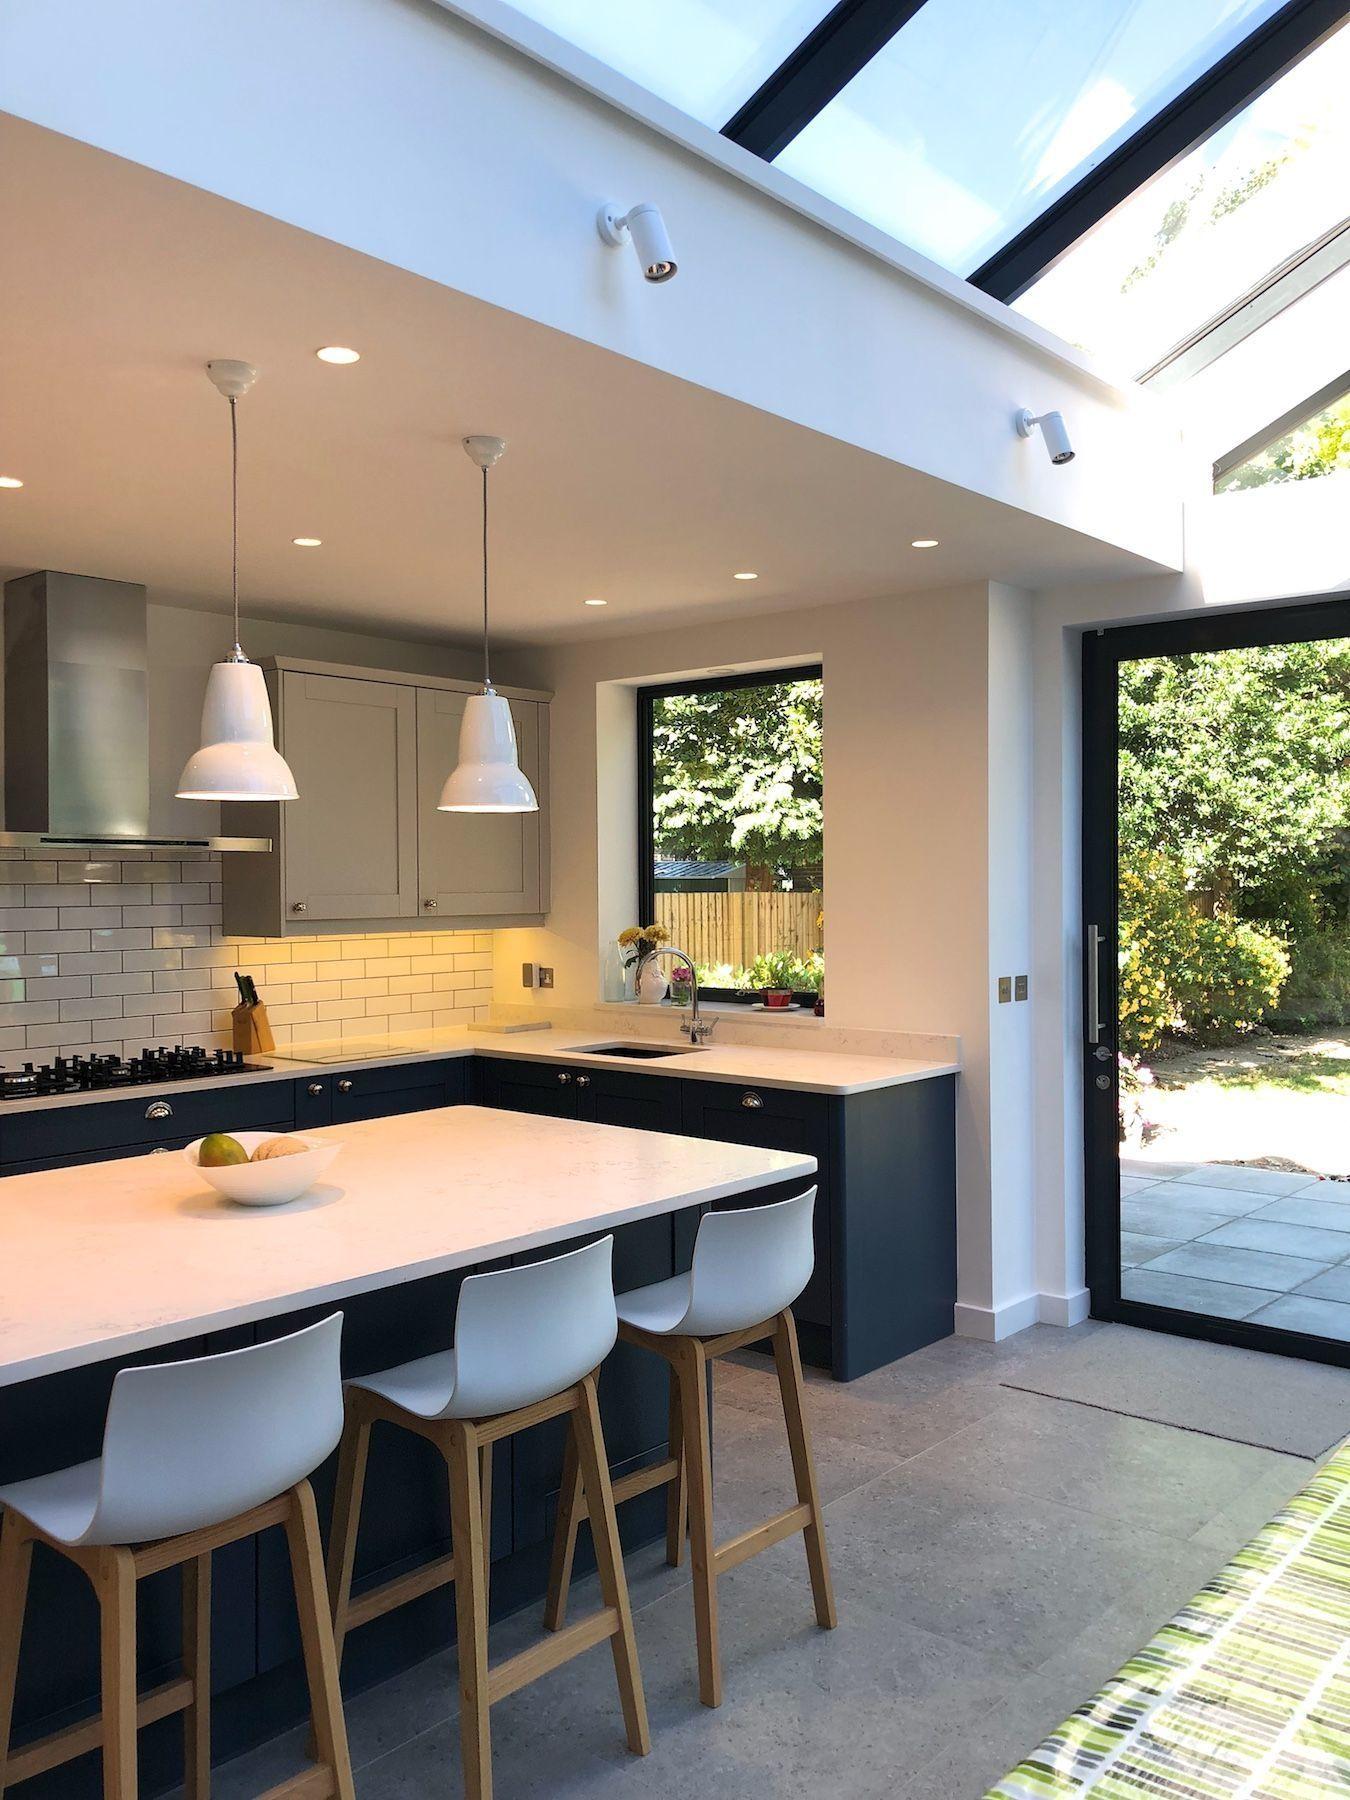 48 Kitchen Bar Stools Keuken Eetkamer Living Keuken Idee